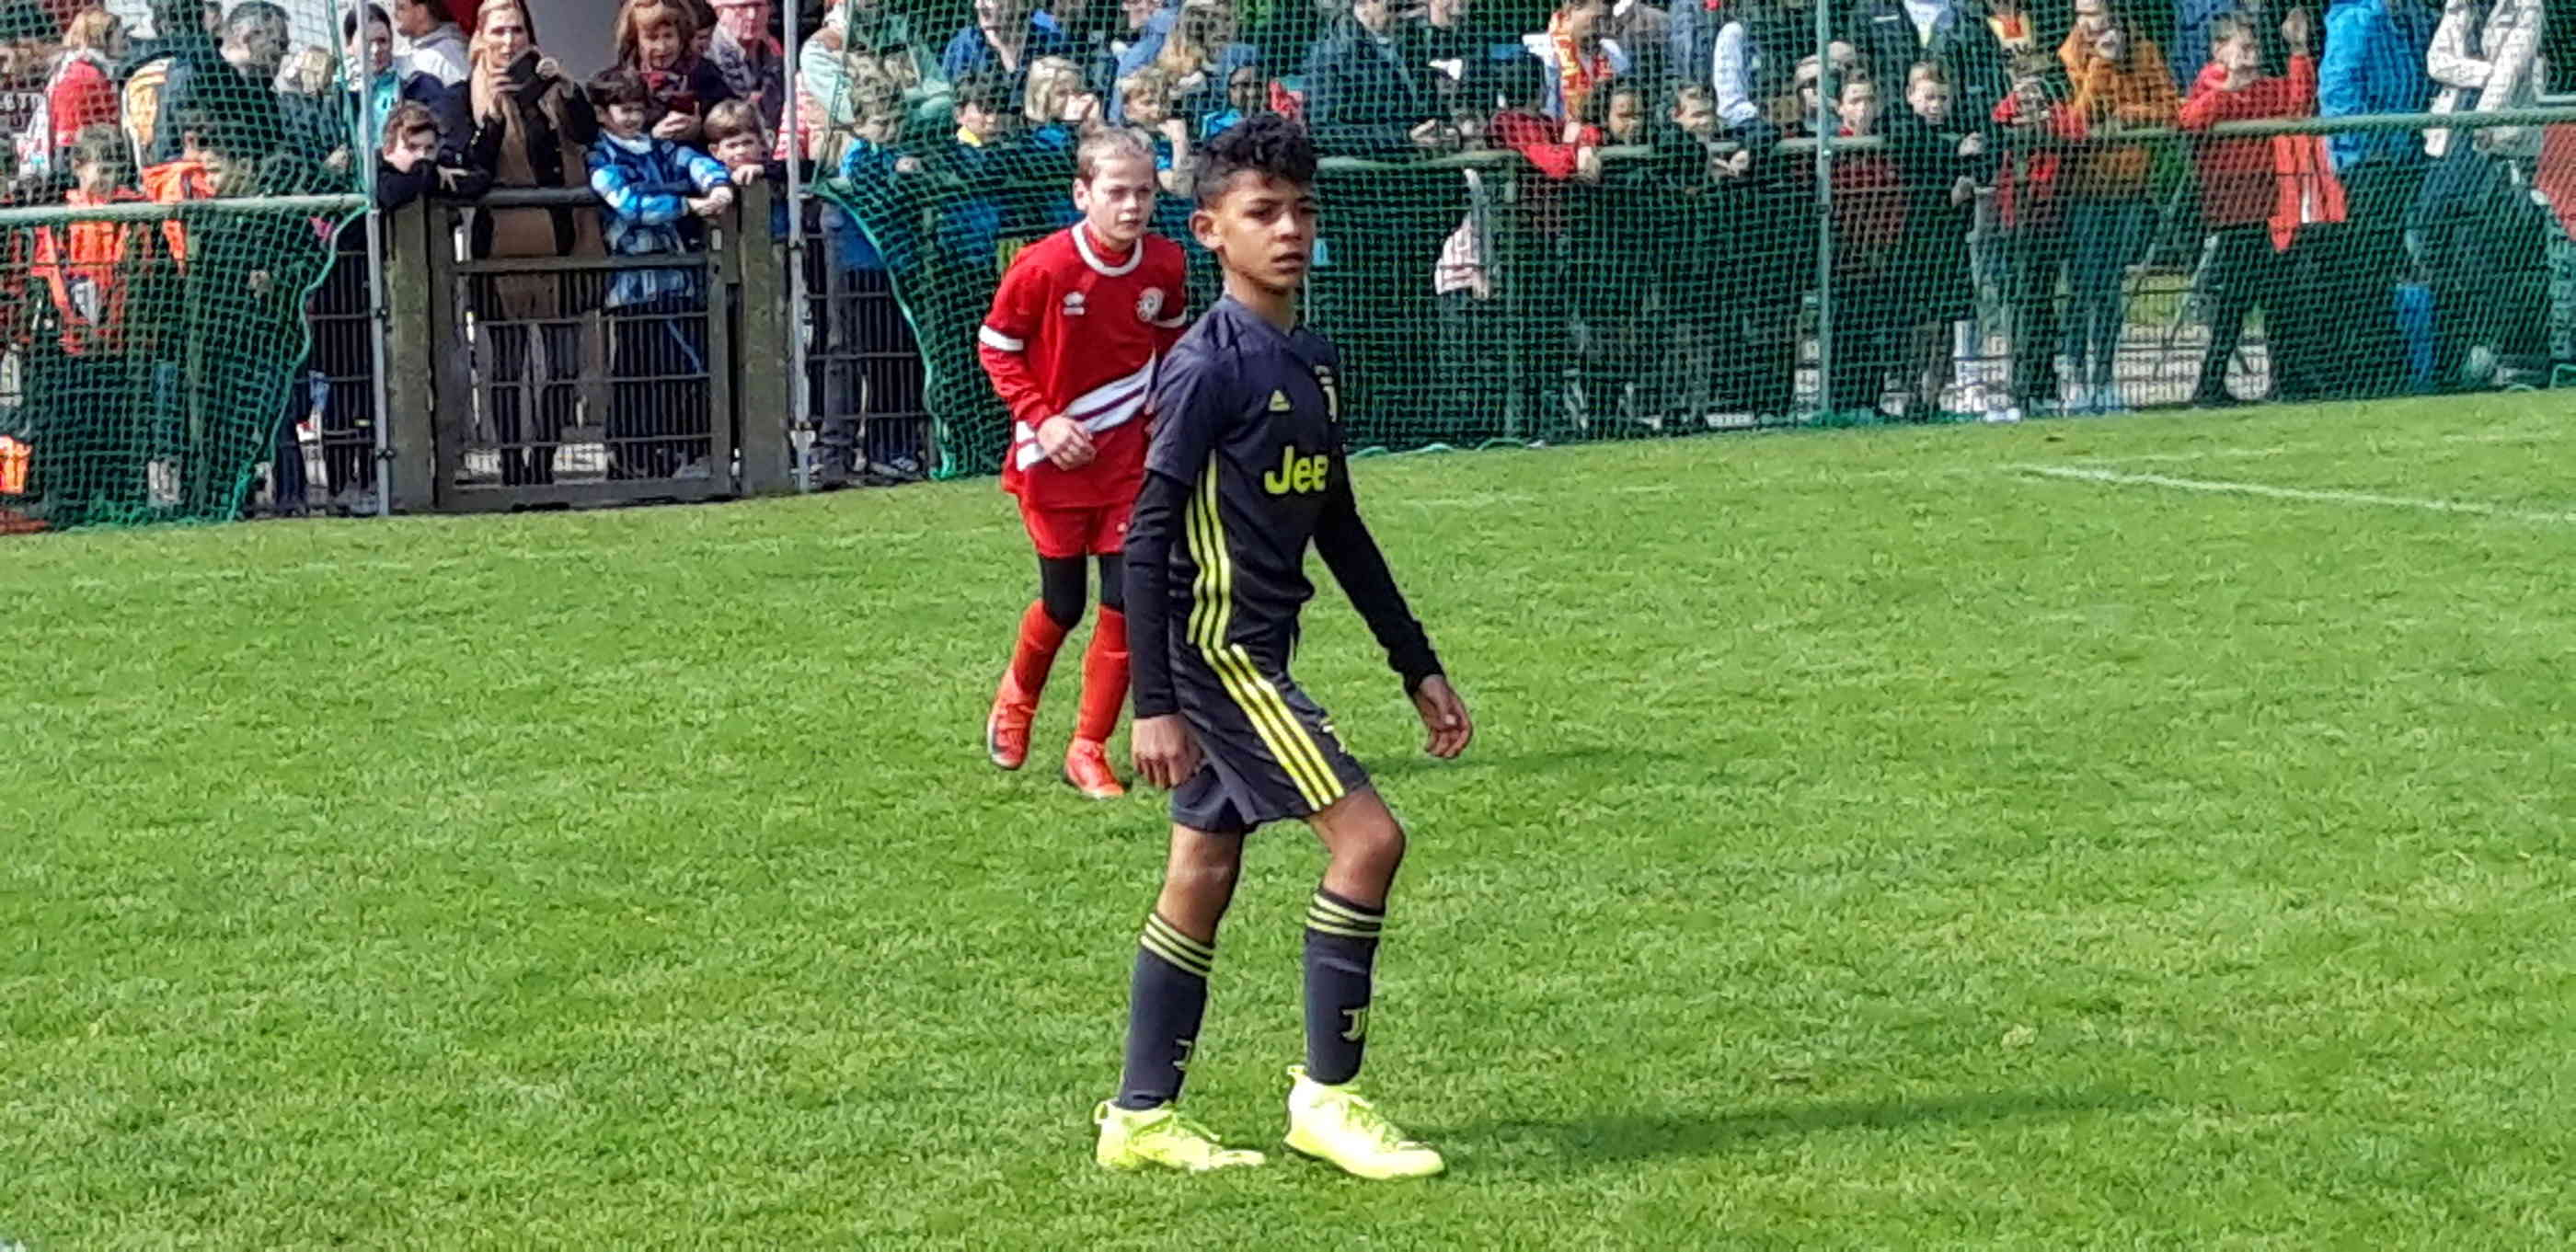 Sohn Von Cristiano Ronaldo Kickt Bei U9 Turnier In Kempen